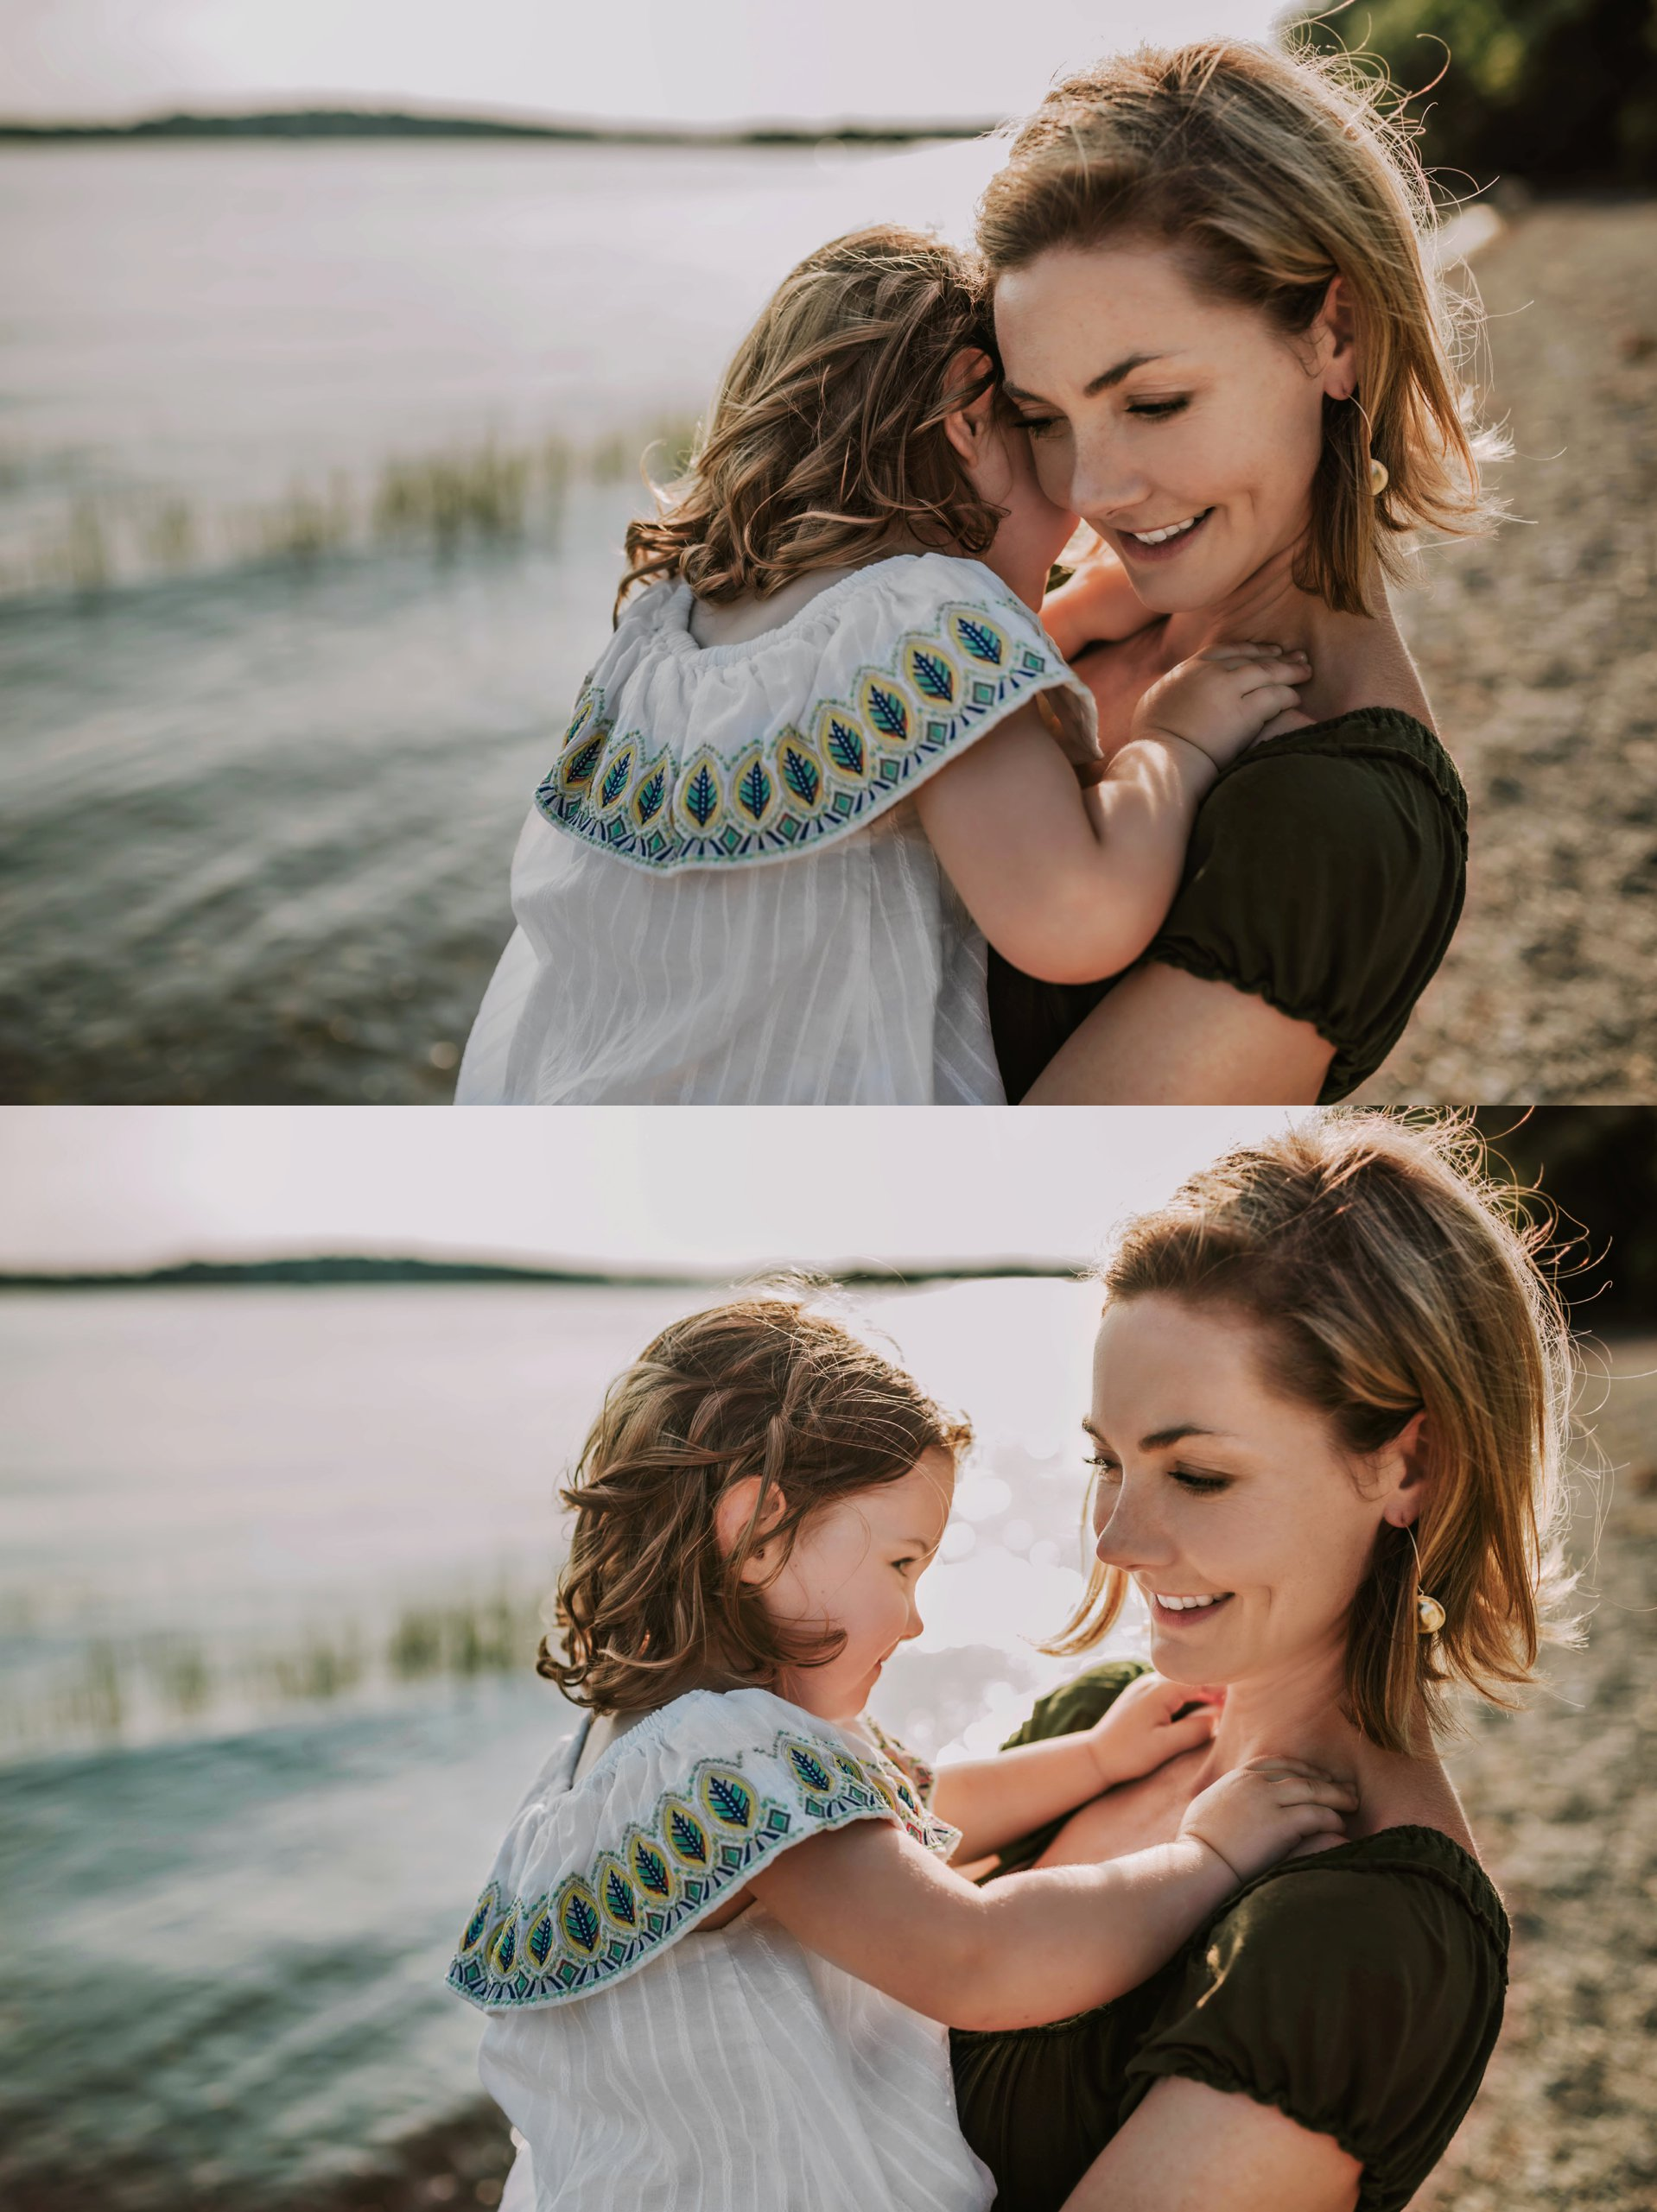 Summers_August_2018-170B_Beautiful_Natural_Portraits_by_Award_Winning_Boston_Massachusetts_Family_Portrait_Photographer_Asher_and_Oak_Photography.jpg